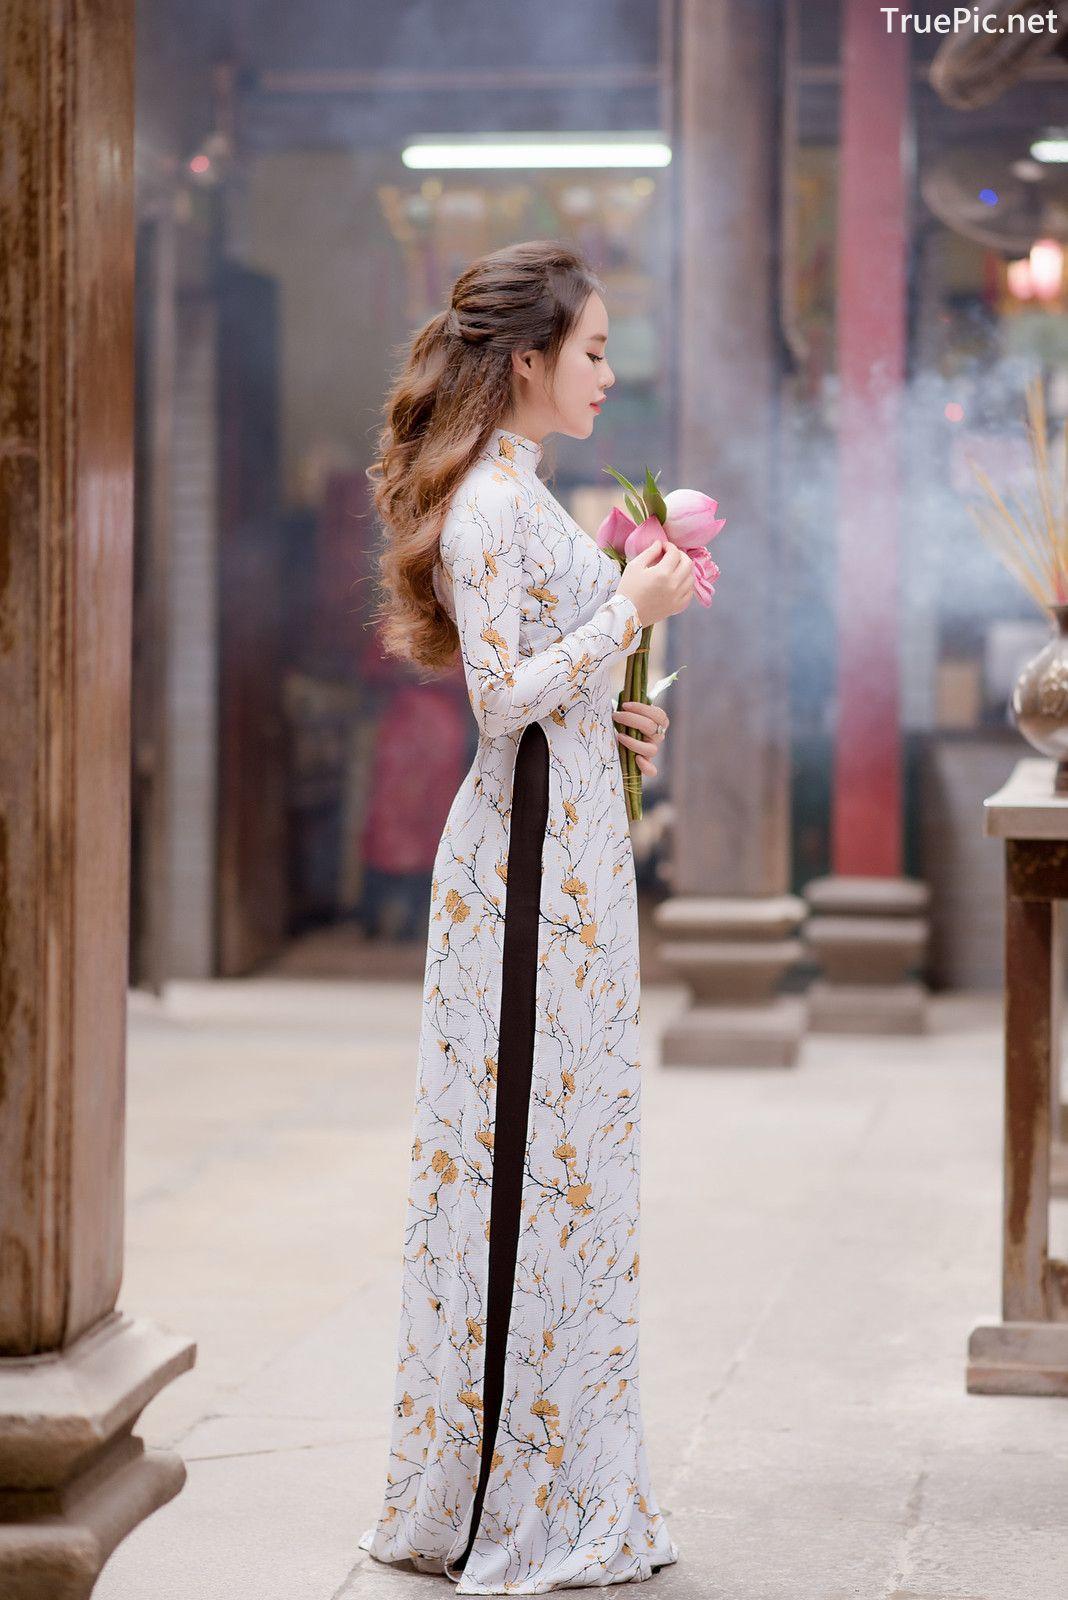 Image-Vietnamese-Beautiful-Girl-Ao-Dai-Vietnam-Traditional-Dress-by-VIN-Photo-2-TruePic.net- Picture-10